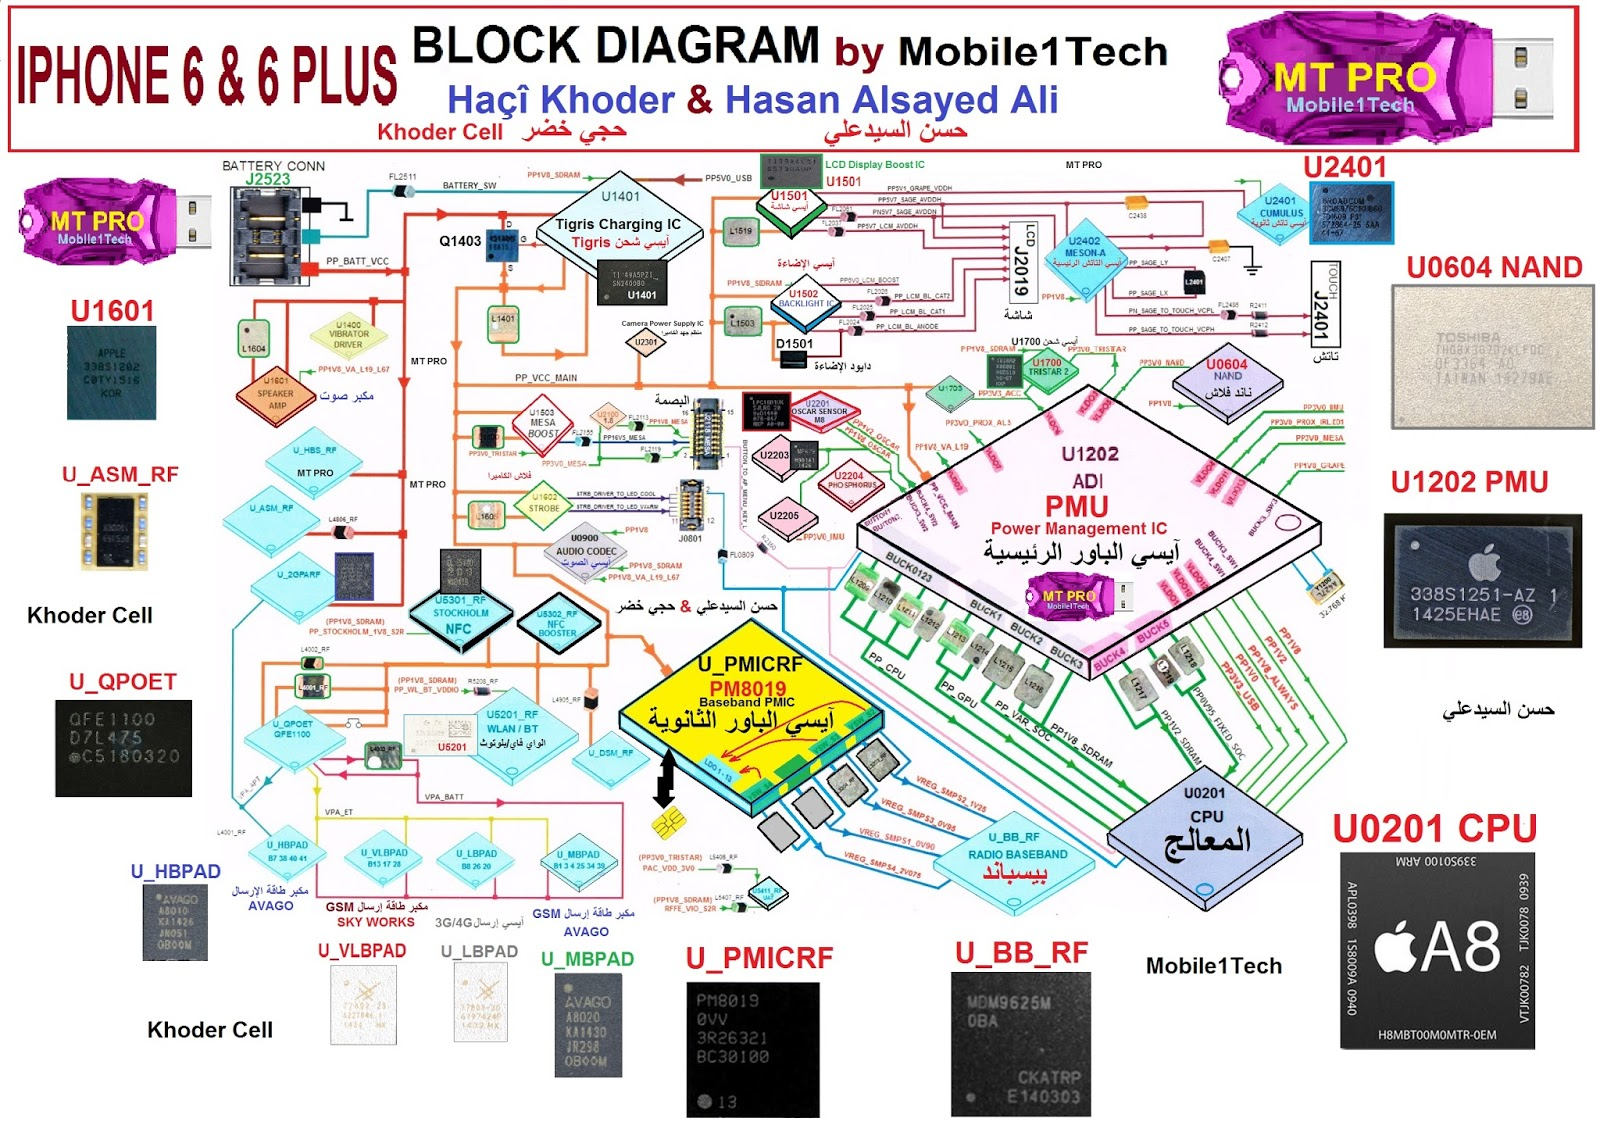 iphone 6 block diagram wiring diagram expert iphone 4 block diagram [ 1600 x 1129 Pixel ]